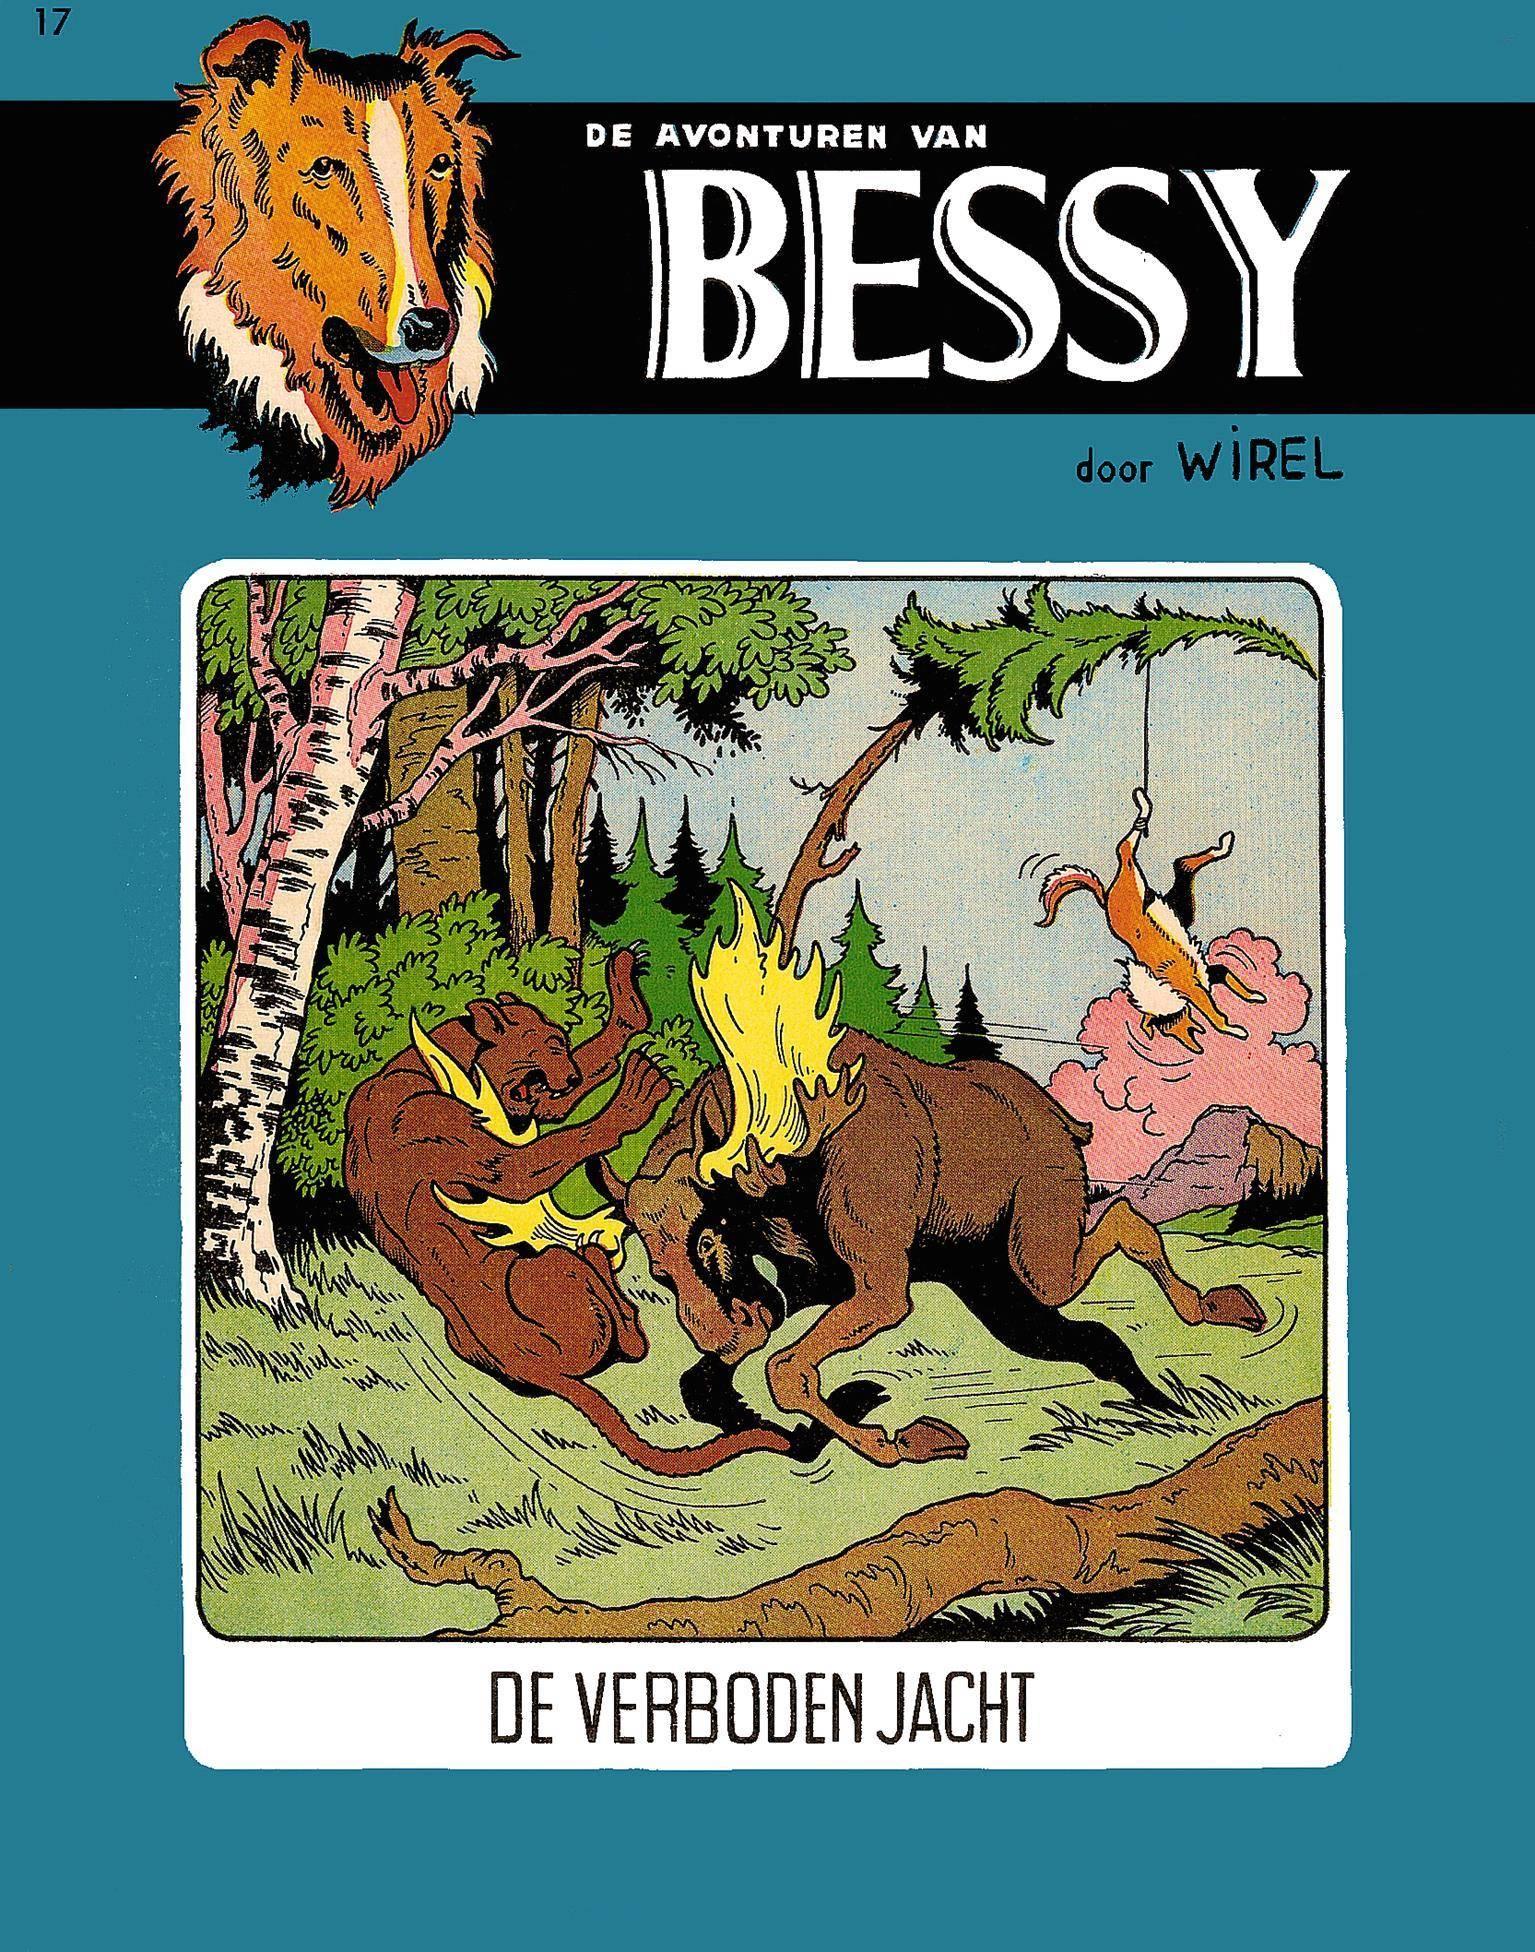 Bessy - 017 - De Verboden Jacht 1957 cbr